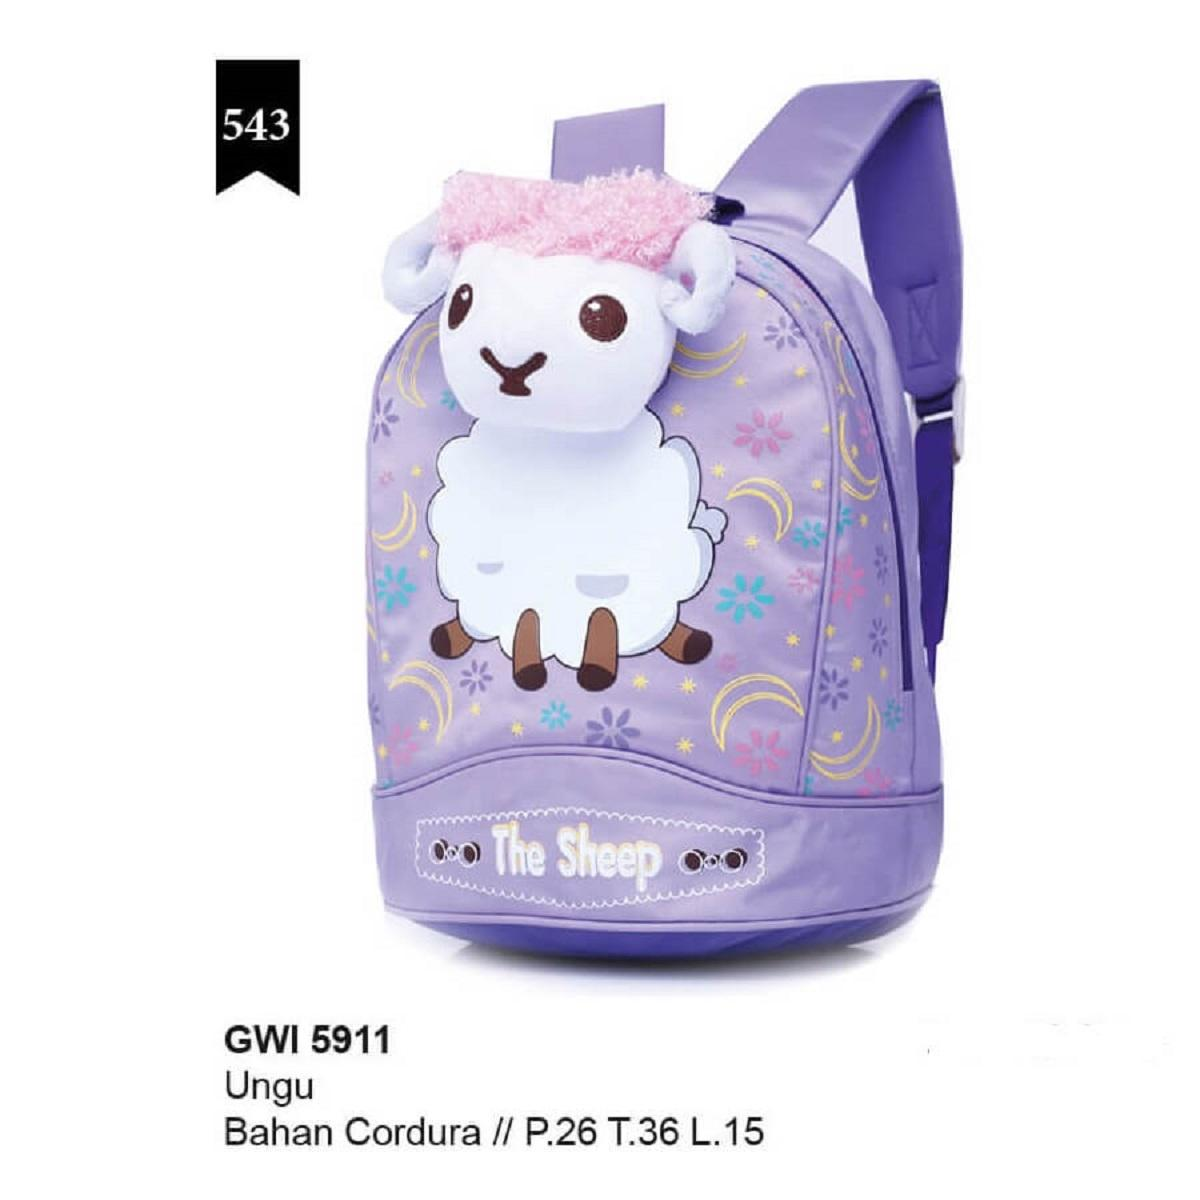 tas sekolah anak perempuan/tas sekolah anak tk/sd/tas ransel anak karakter saun the sheep original  by garsel